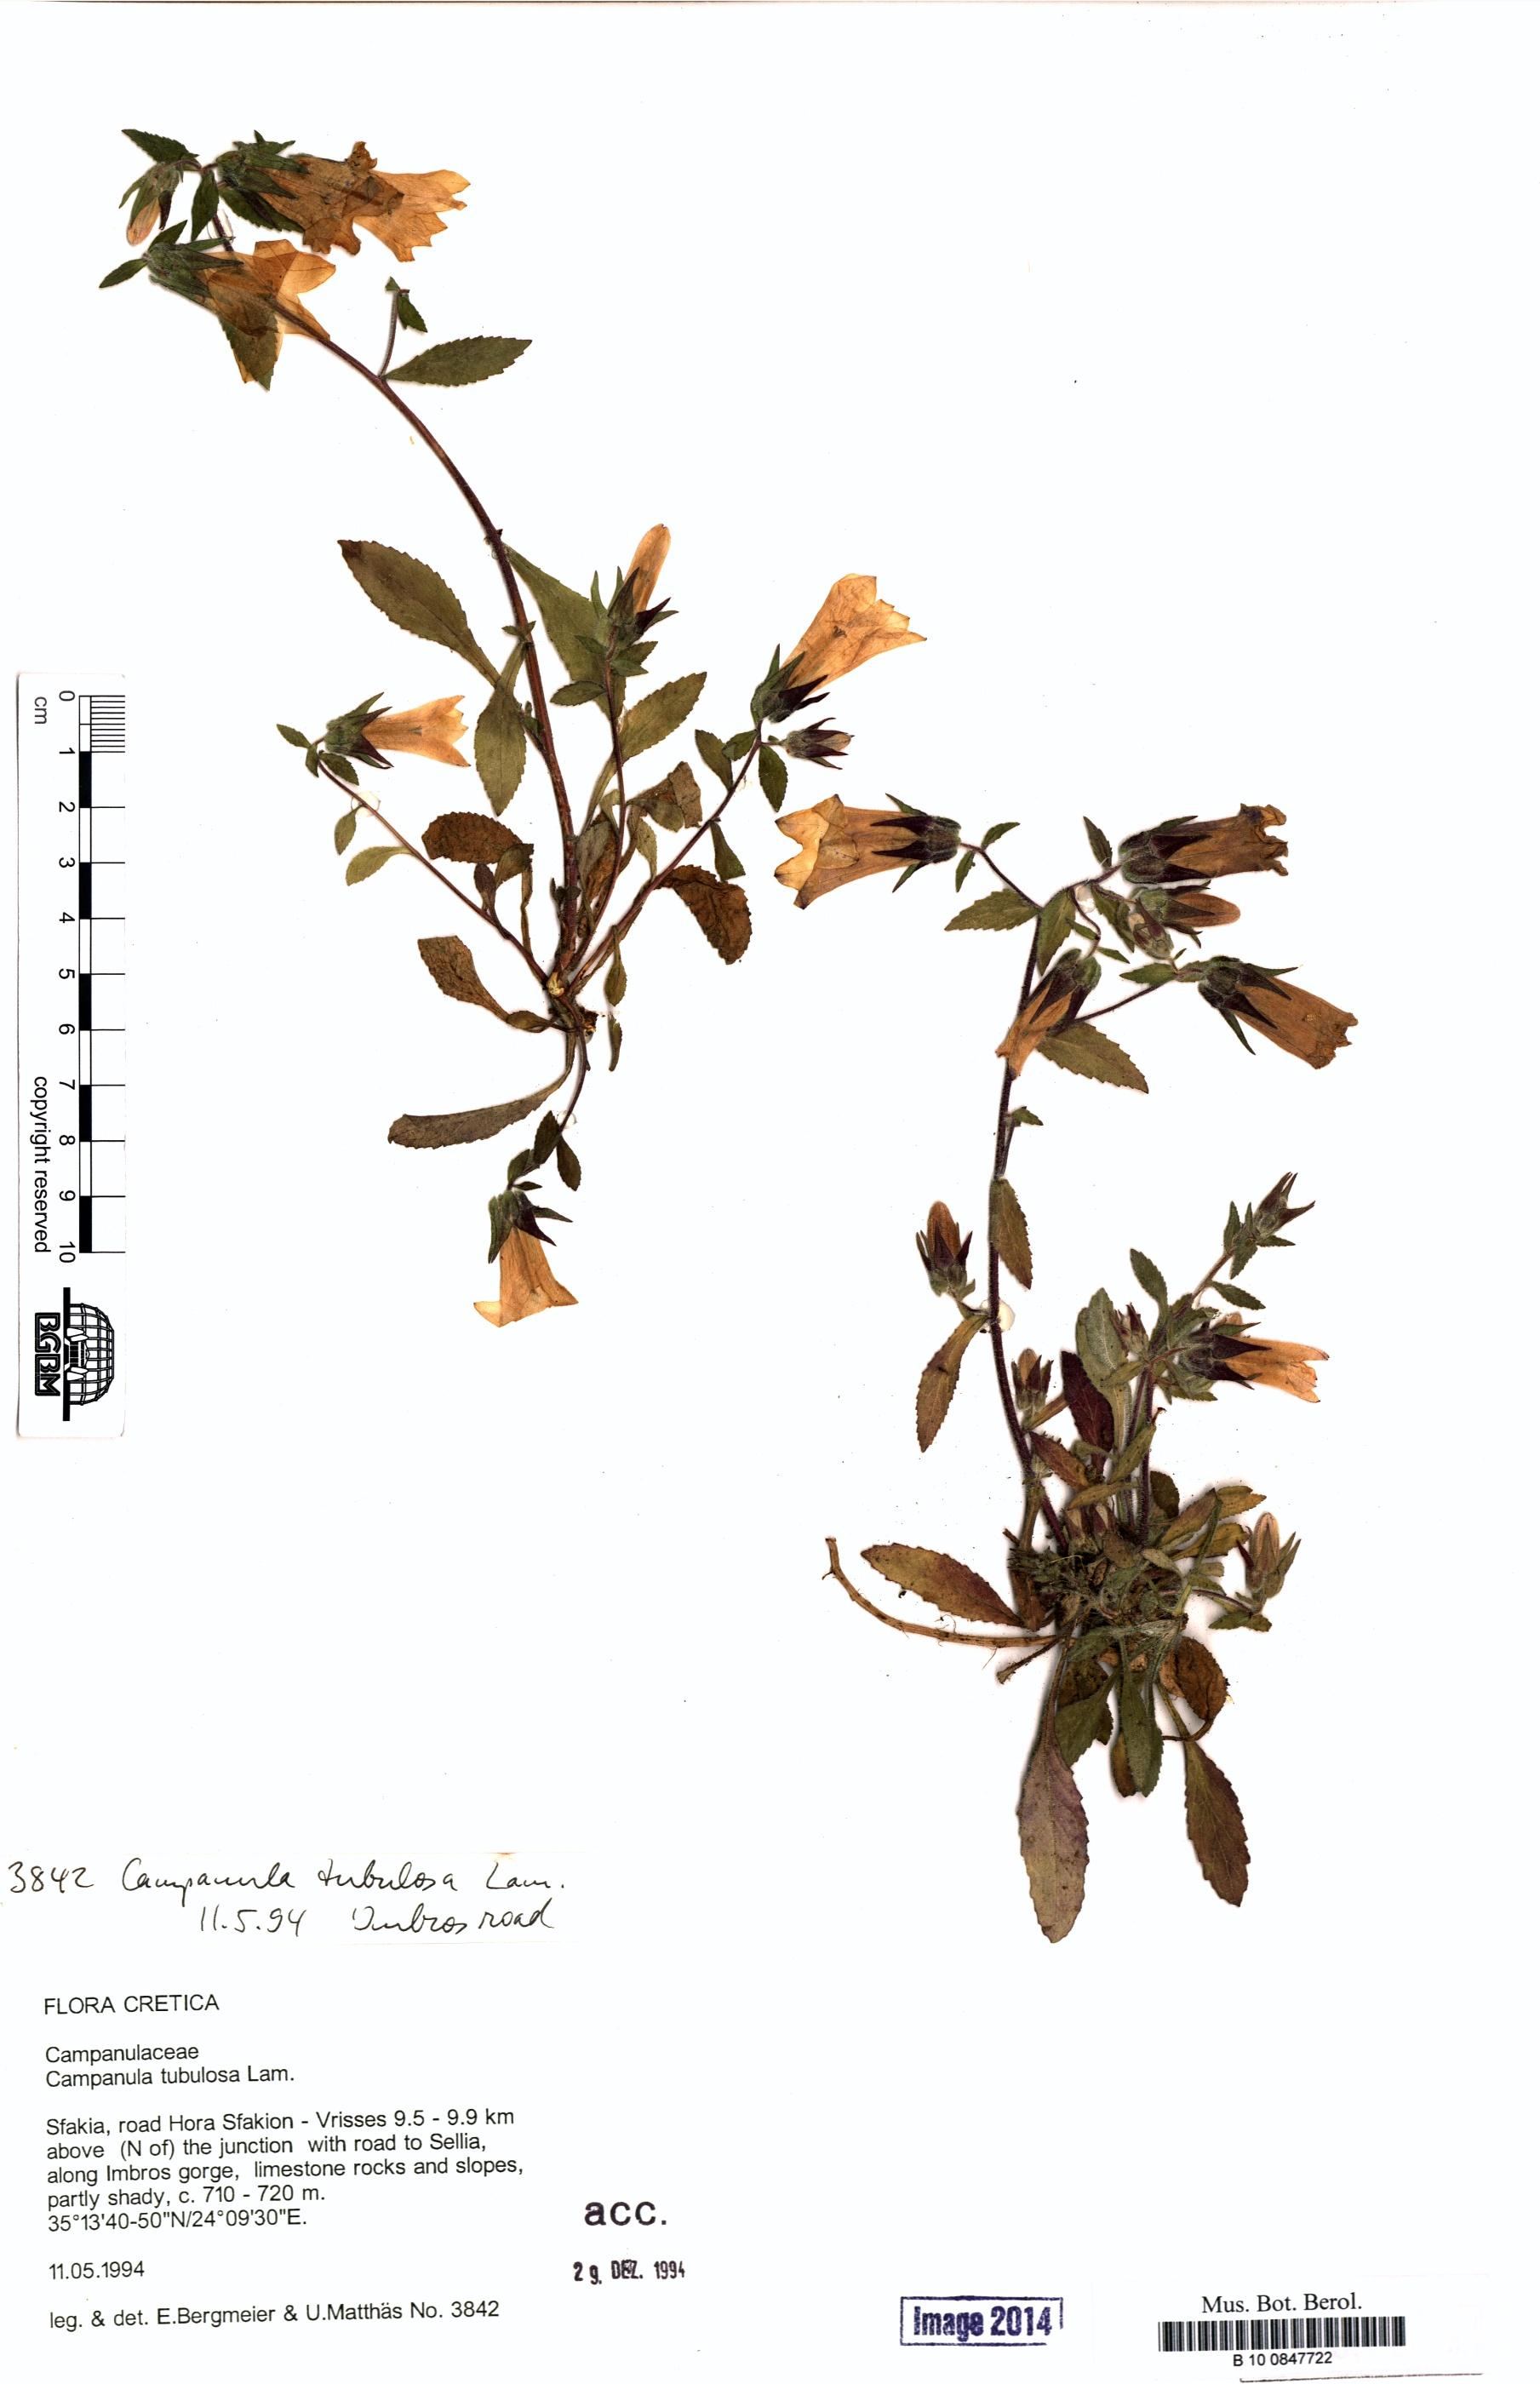 http://ww2.bgbm.org/herbarium/images/B/10/08/47/72/B_10_0847722.jpg